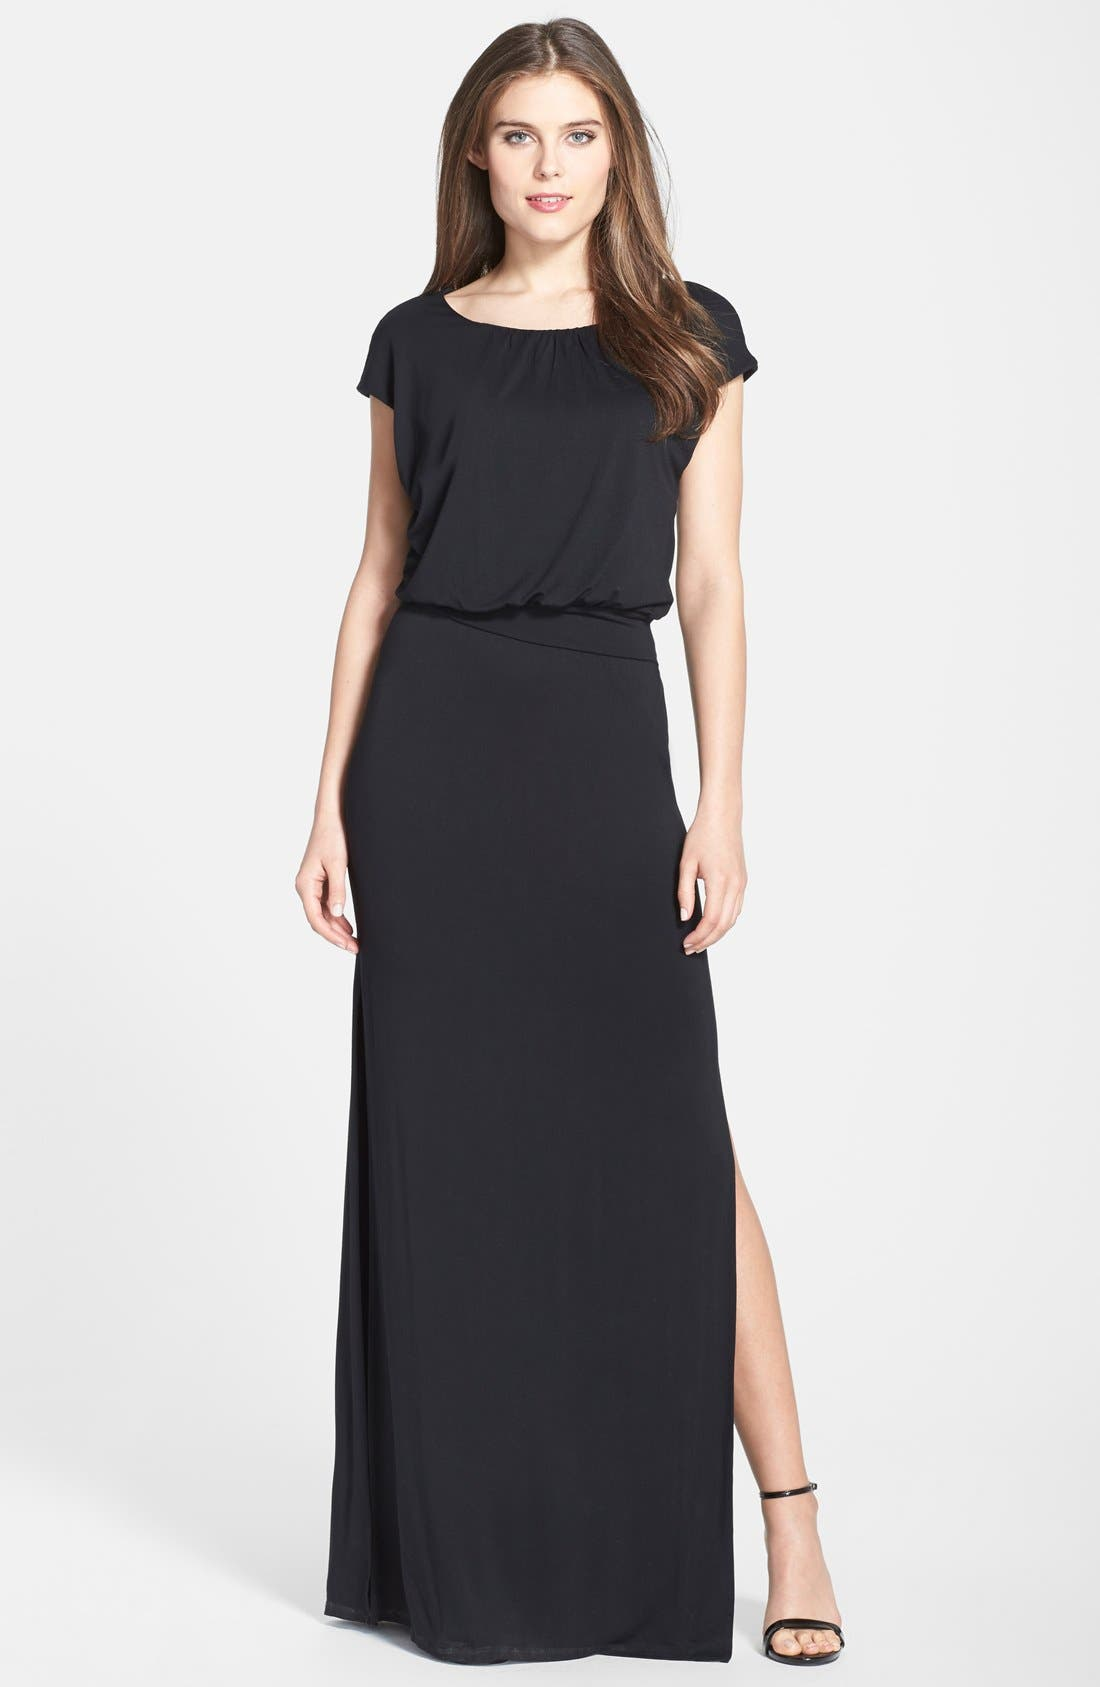 Alternate Image 3  - Felicity & Coco 'Vienna' Blouson Maxi Dress (Nordstrom Exclusive)